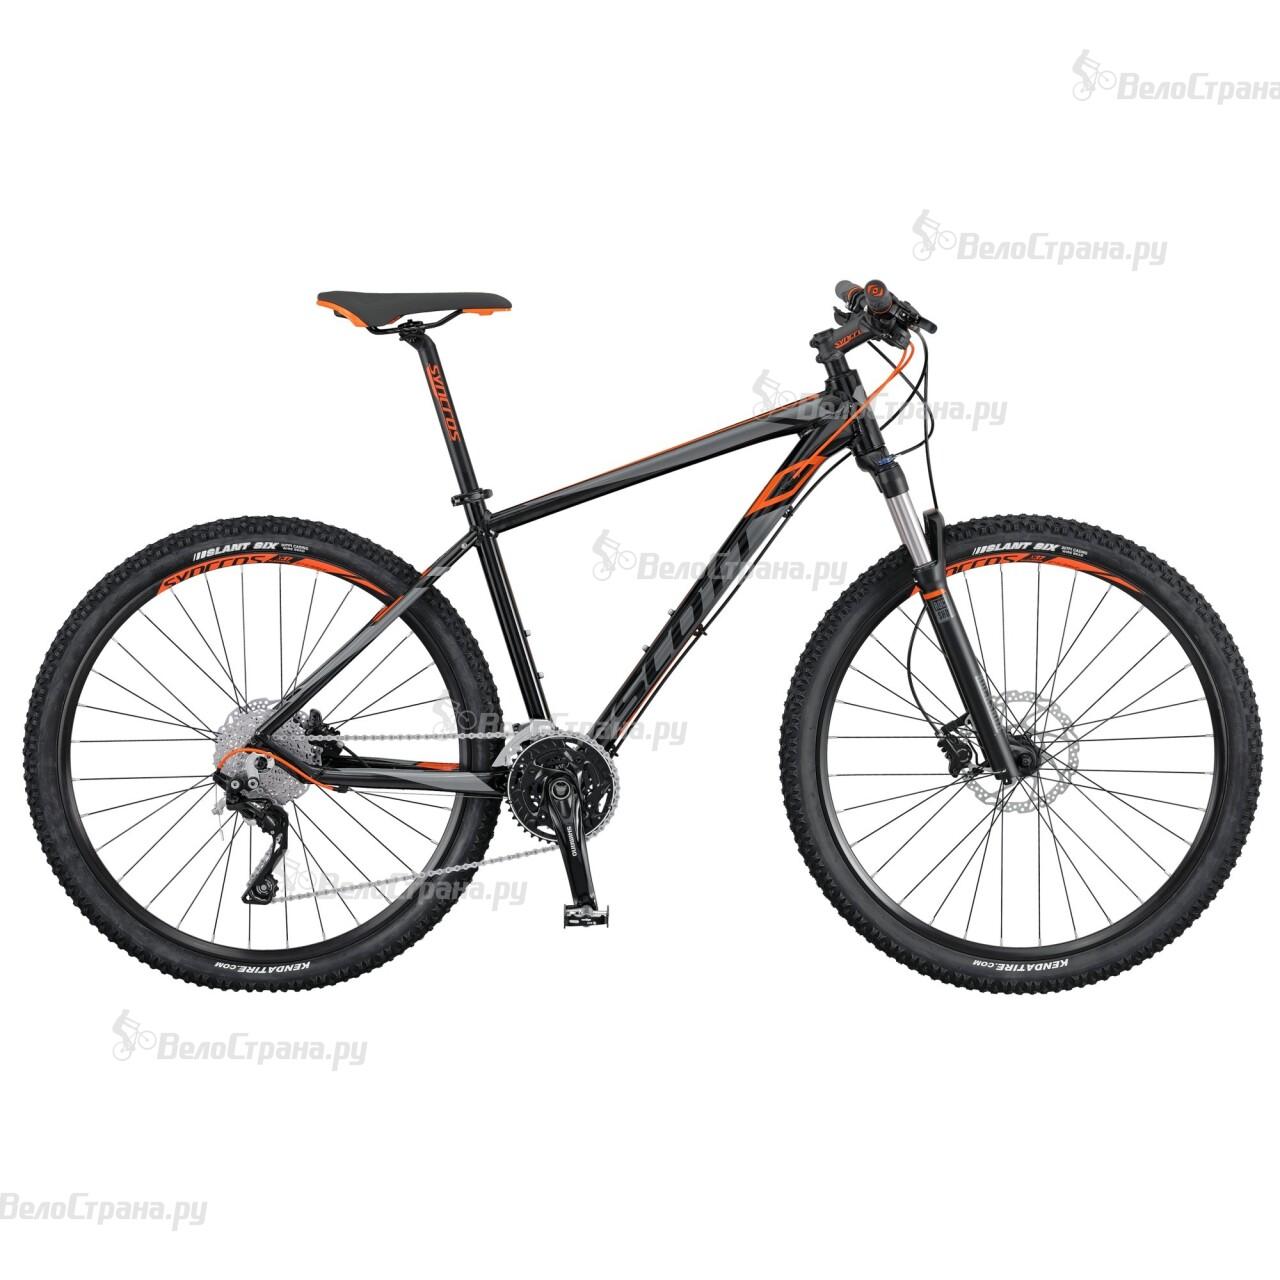 Велосипед Scott Aspect 910 (2016)